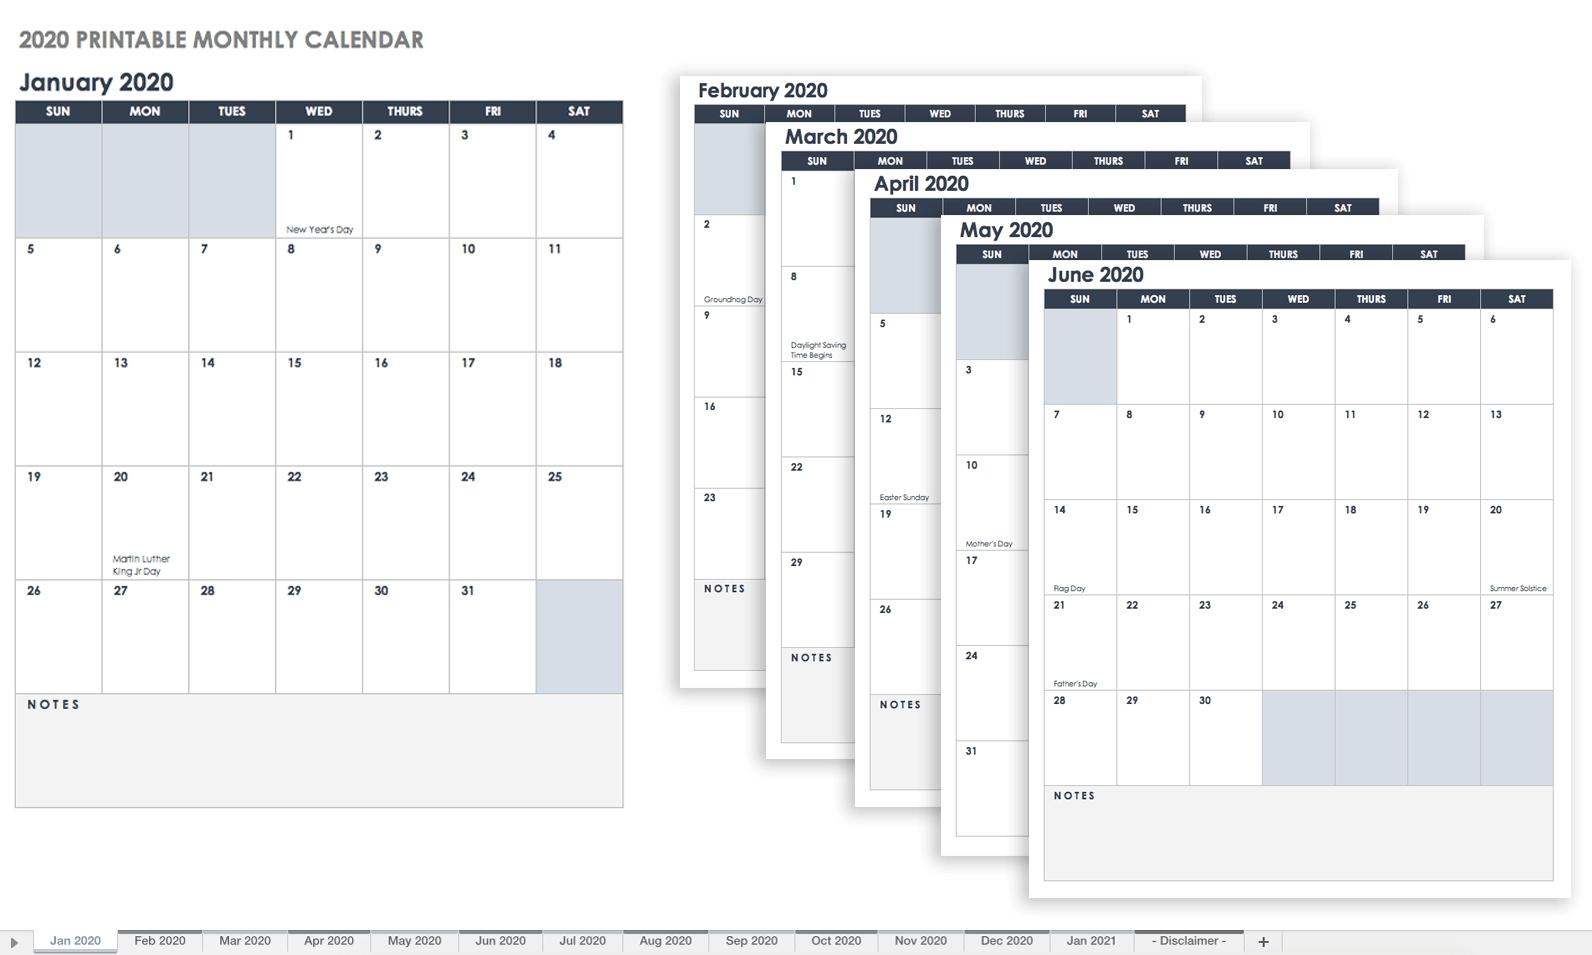 Large Box Printable Calendar 2020 Google - Calendar throughout Google Free Printable Calendars 2020